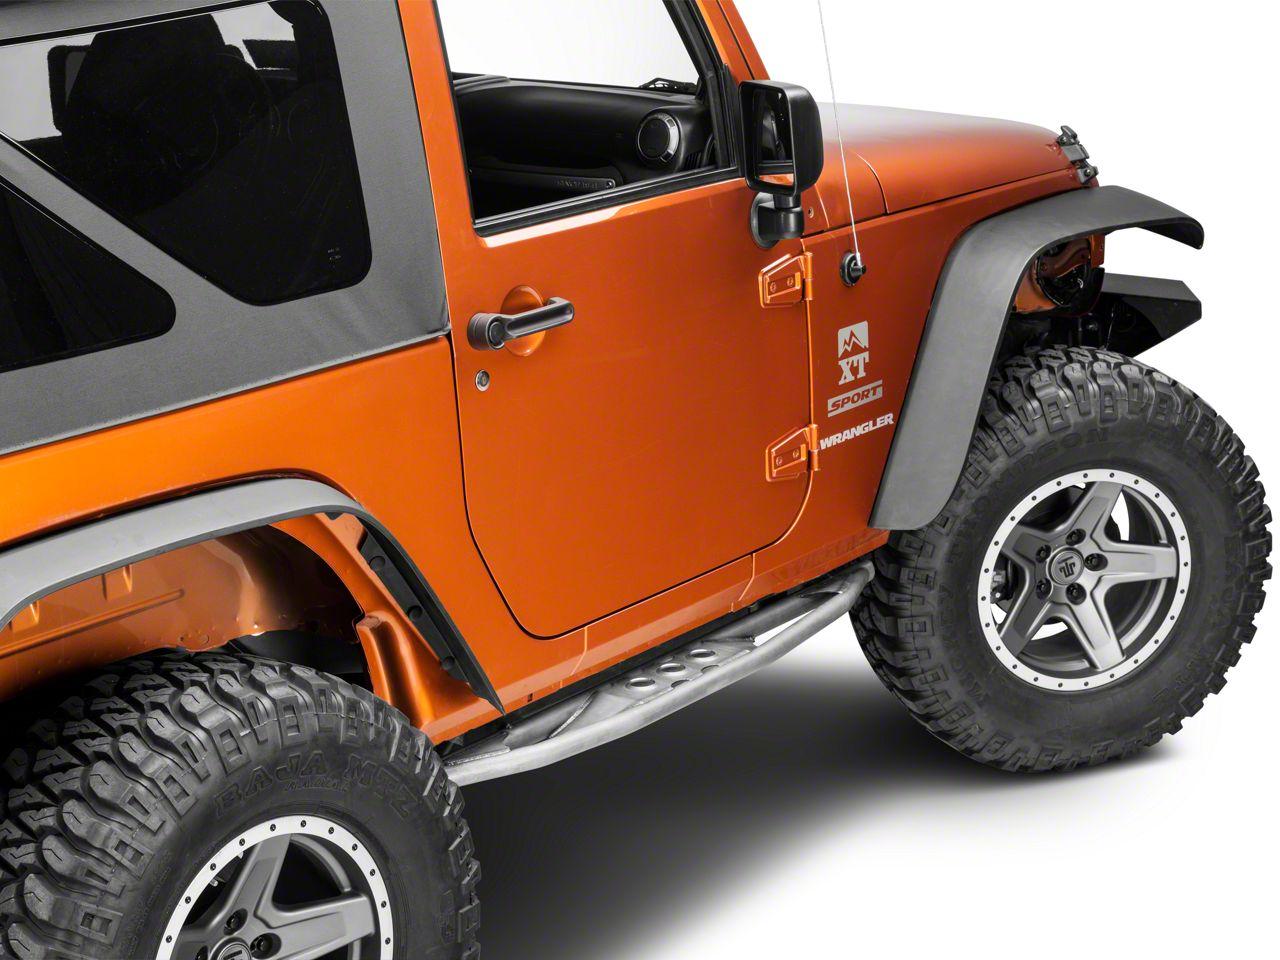 Poison Spyder Frame Mounted Ricochet Rockers (07-18 Jeep Wrangler JK 2 Door)